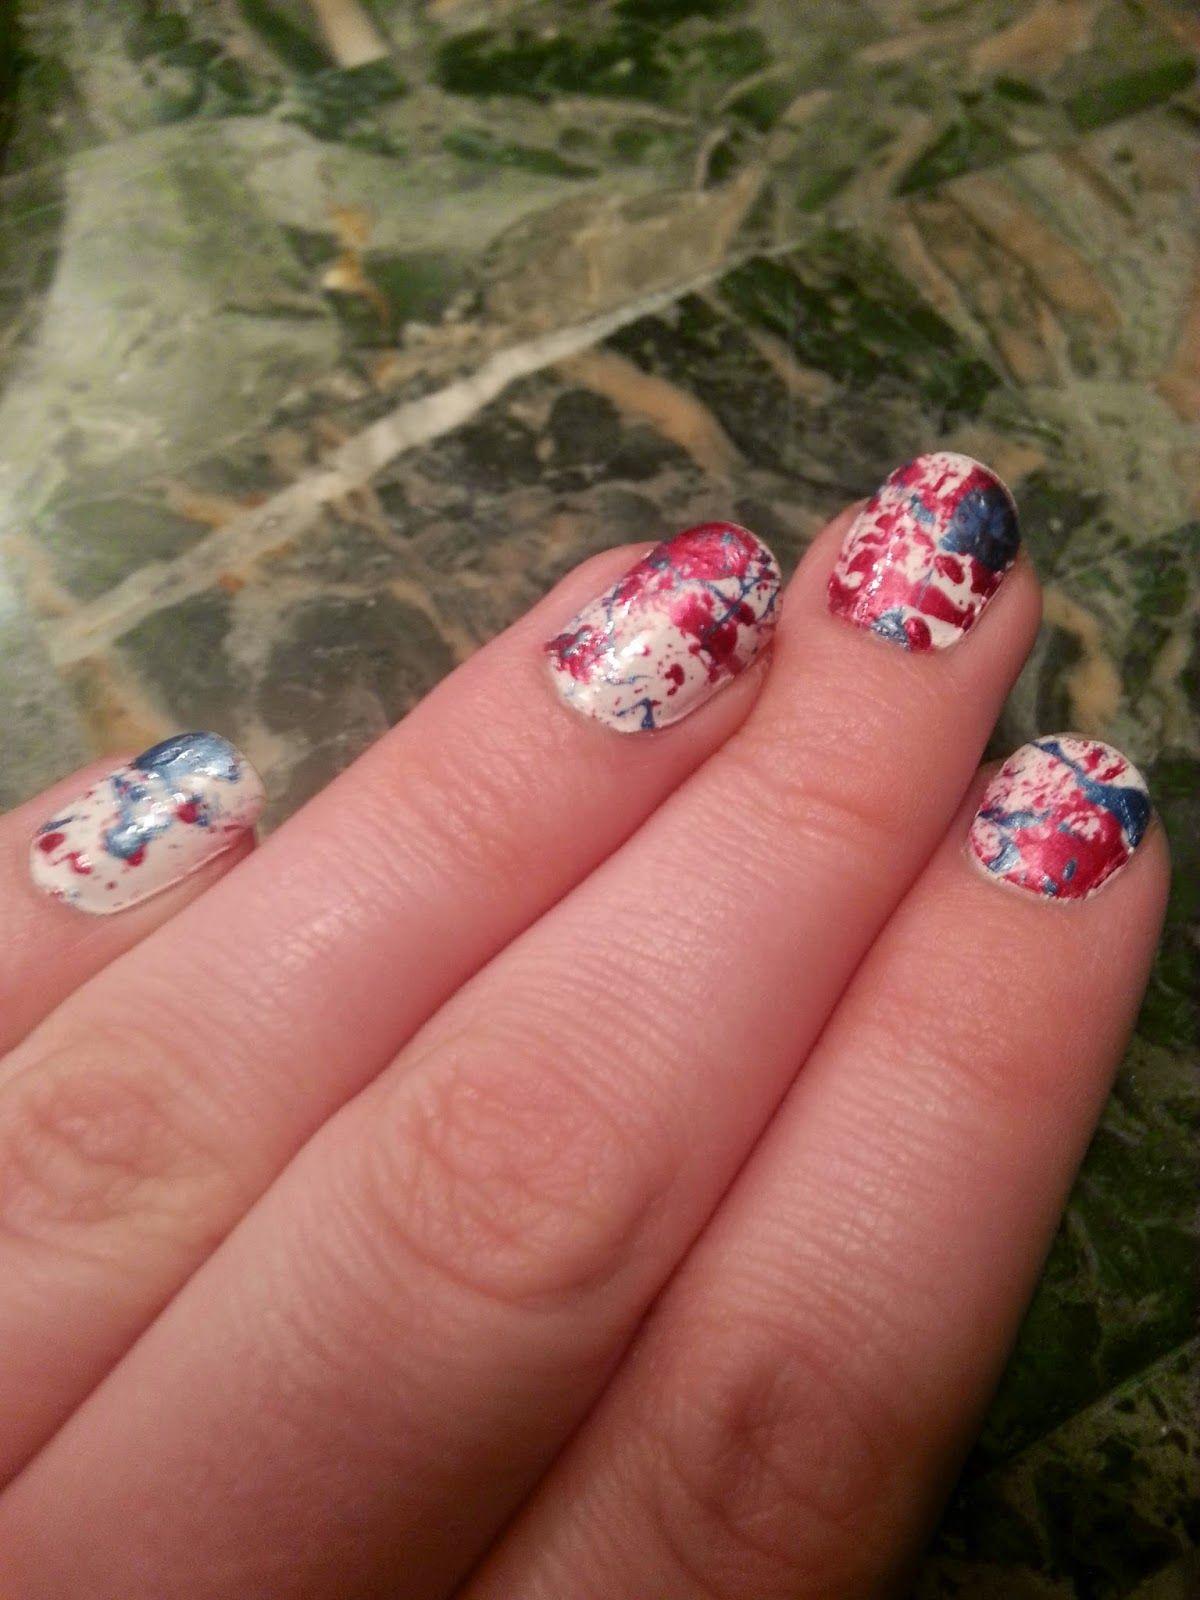 .: Patriotic Paint Splashed Nails DIY